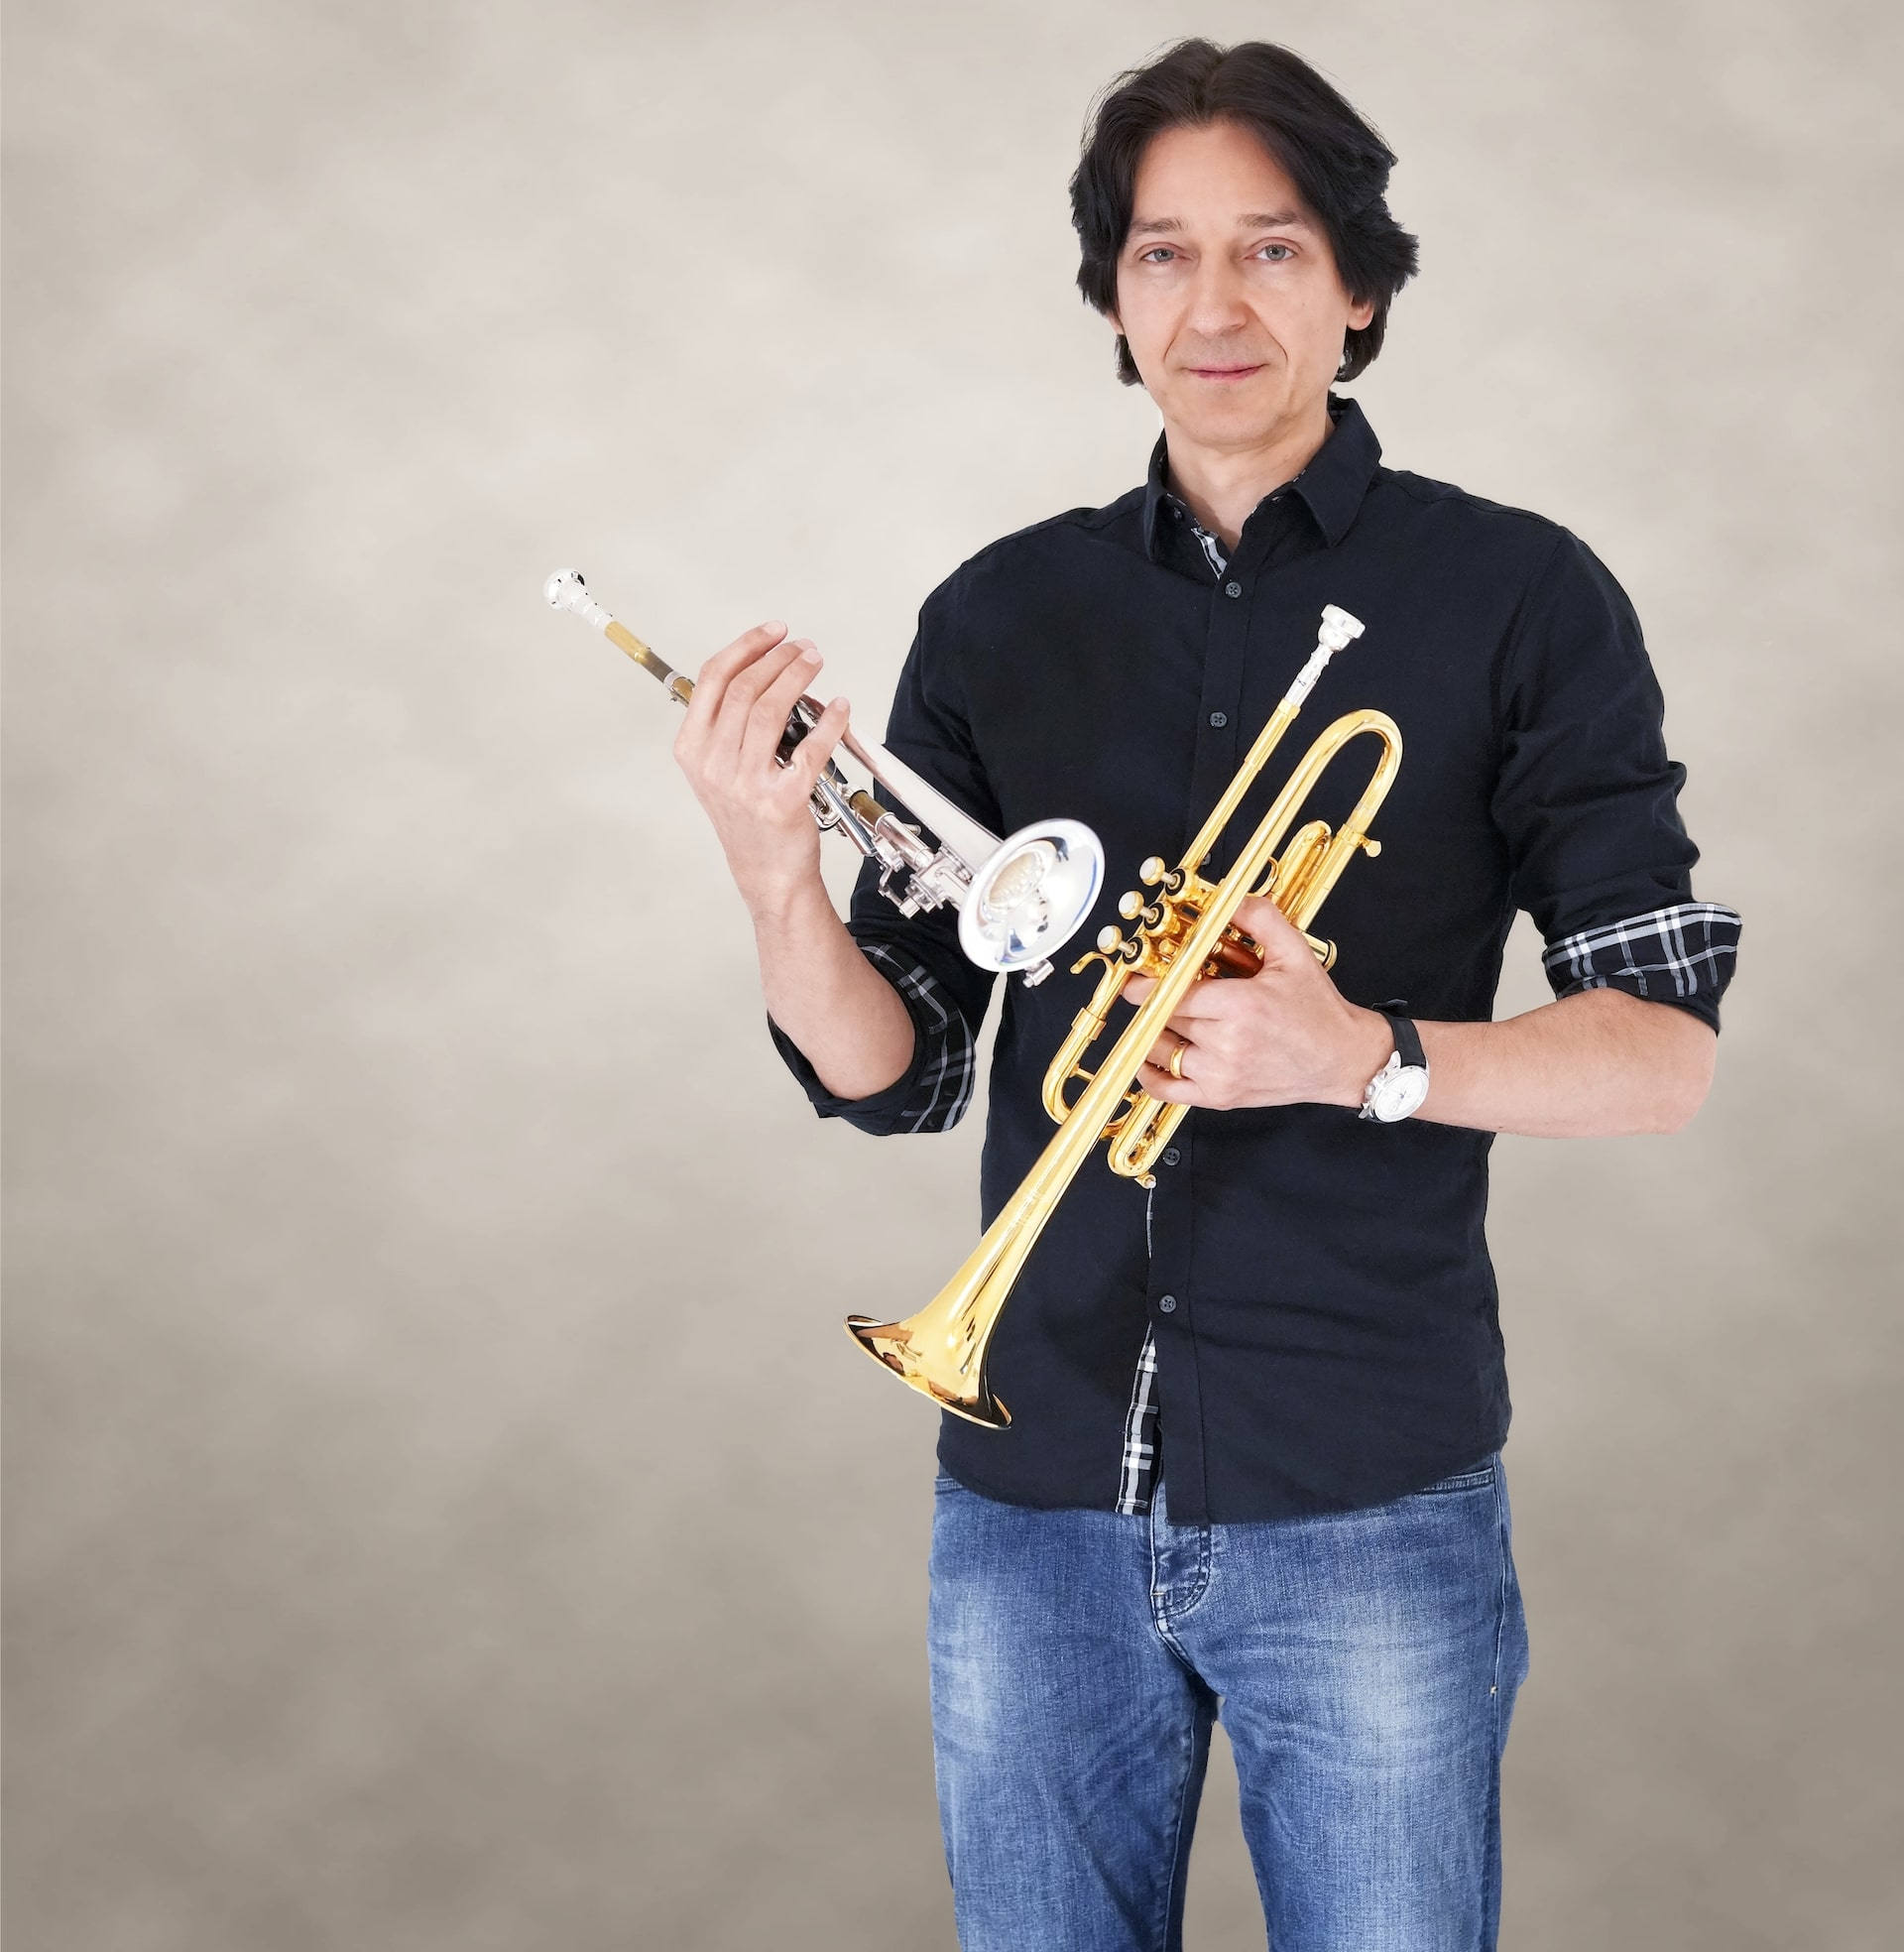 Dozent Kalaidos FH | Musik-Hochschule